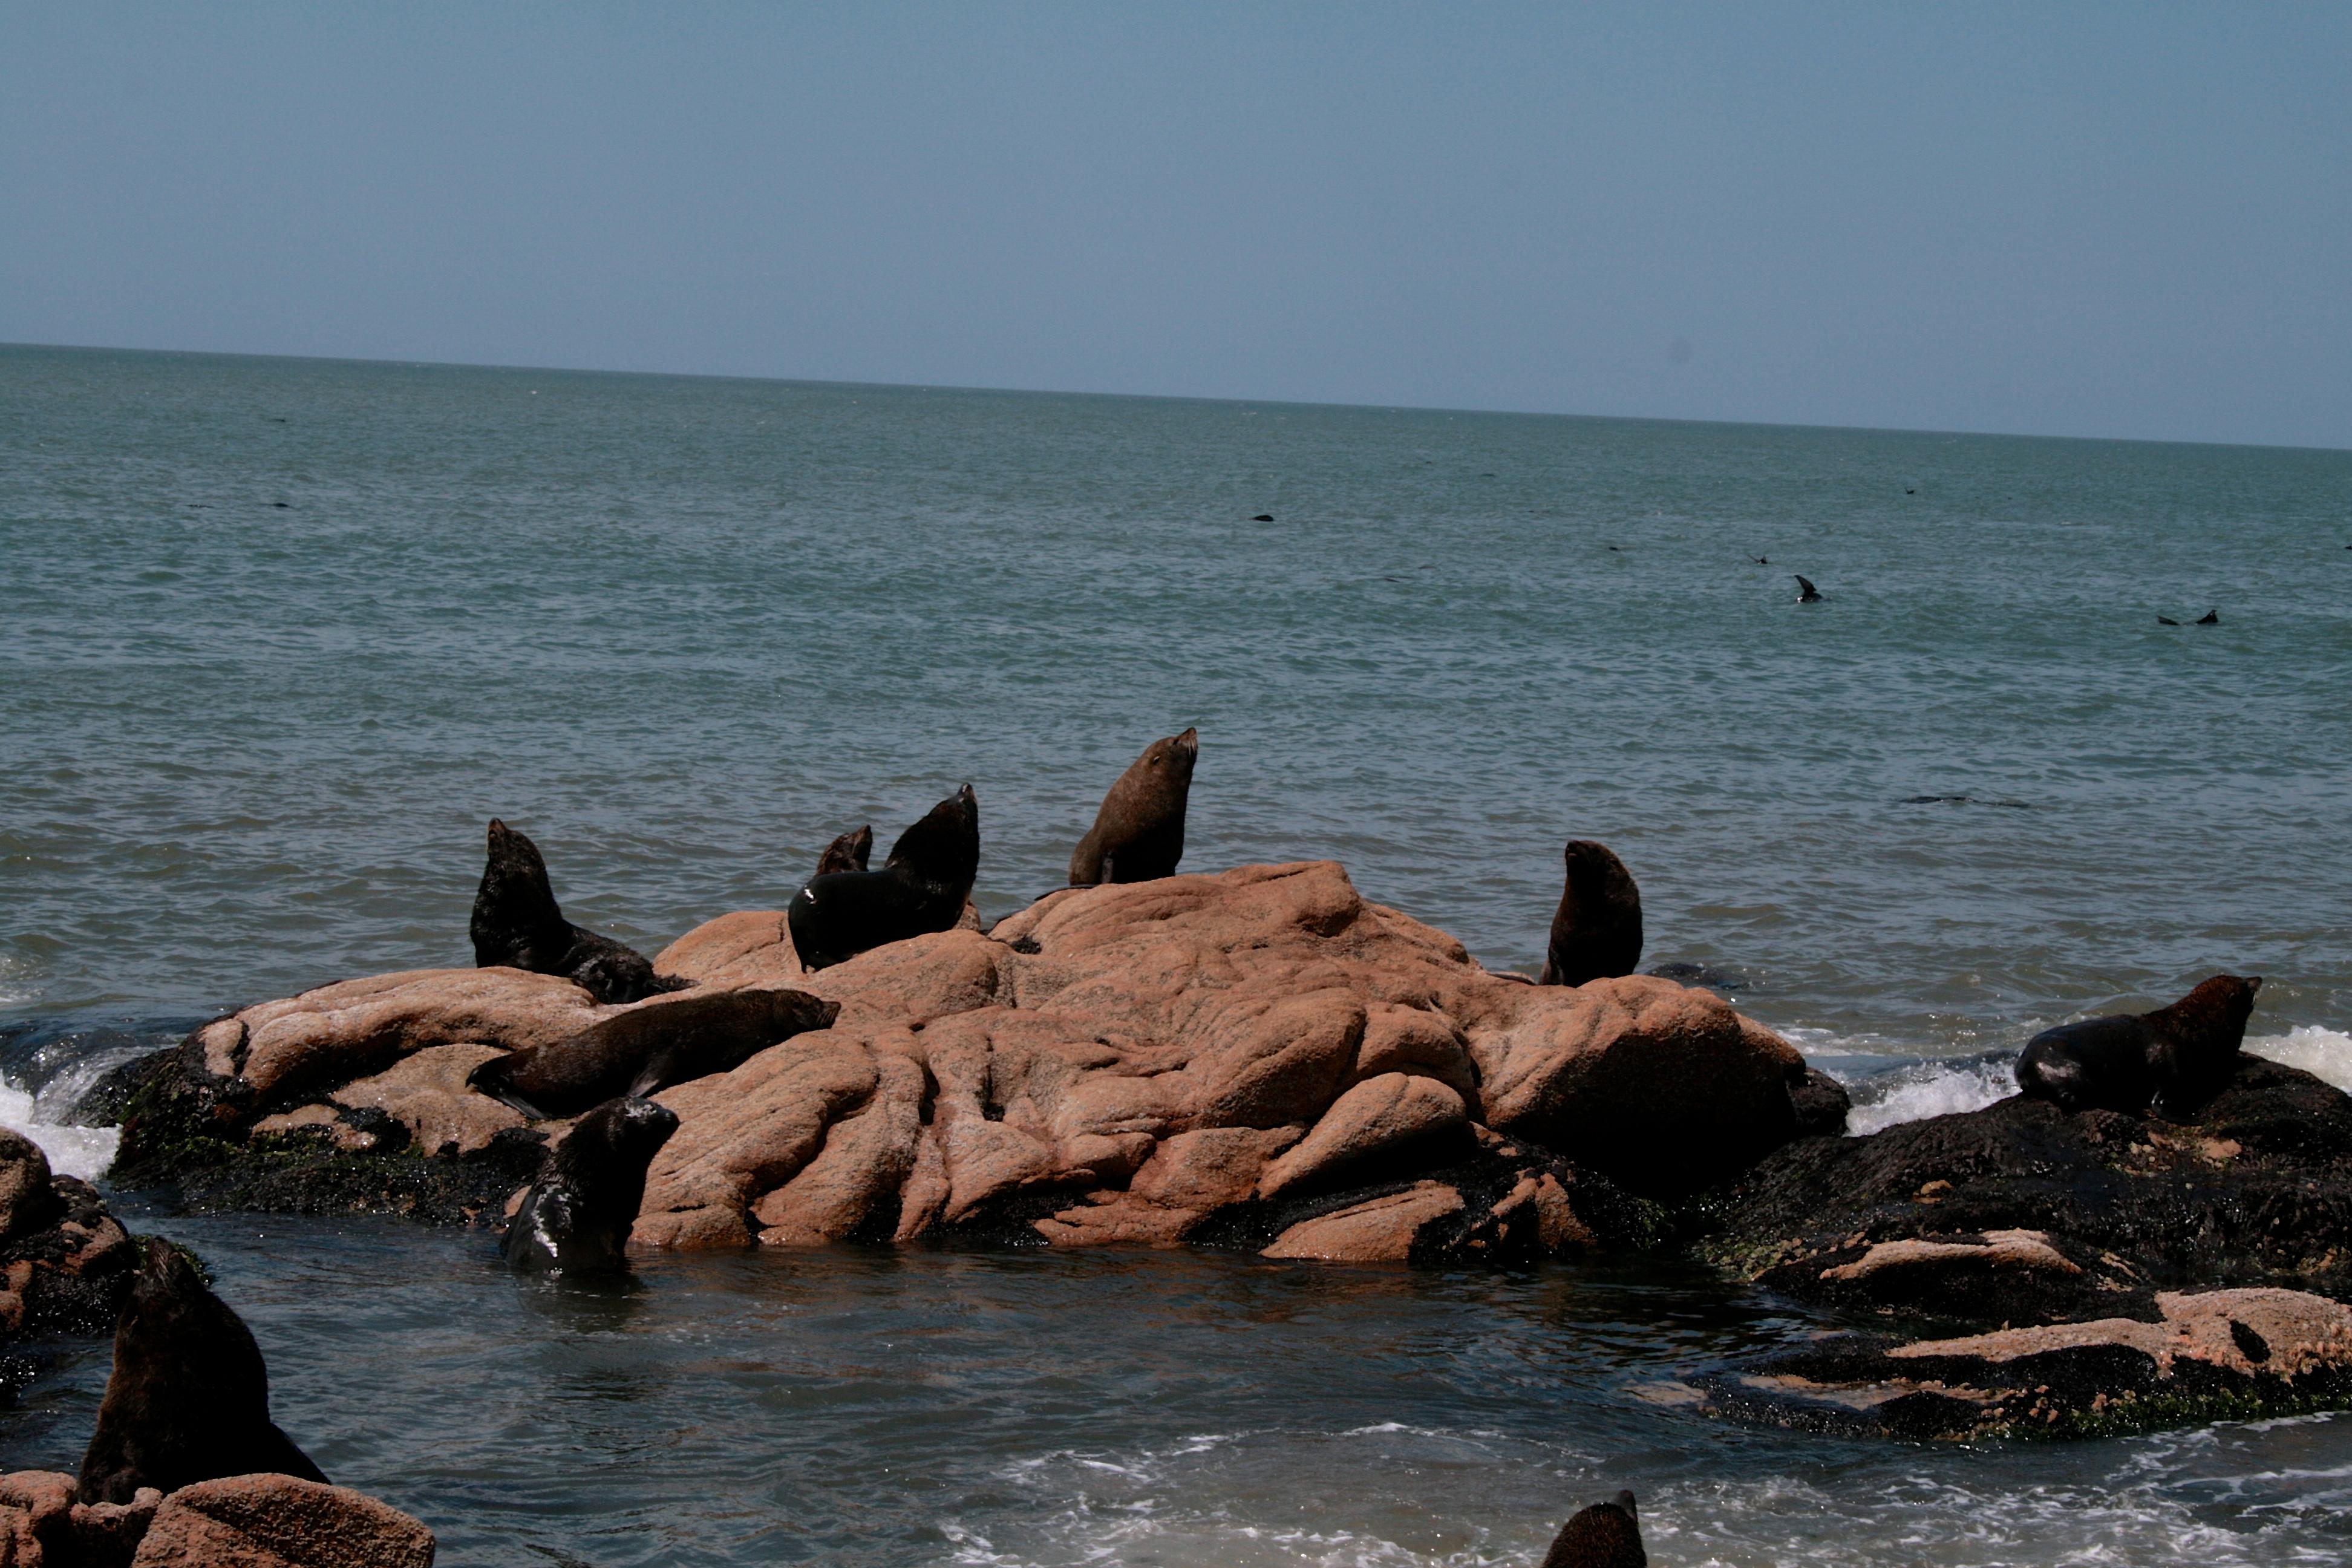 Loups de mer ©daniel di lione